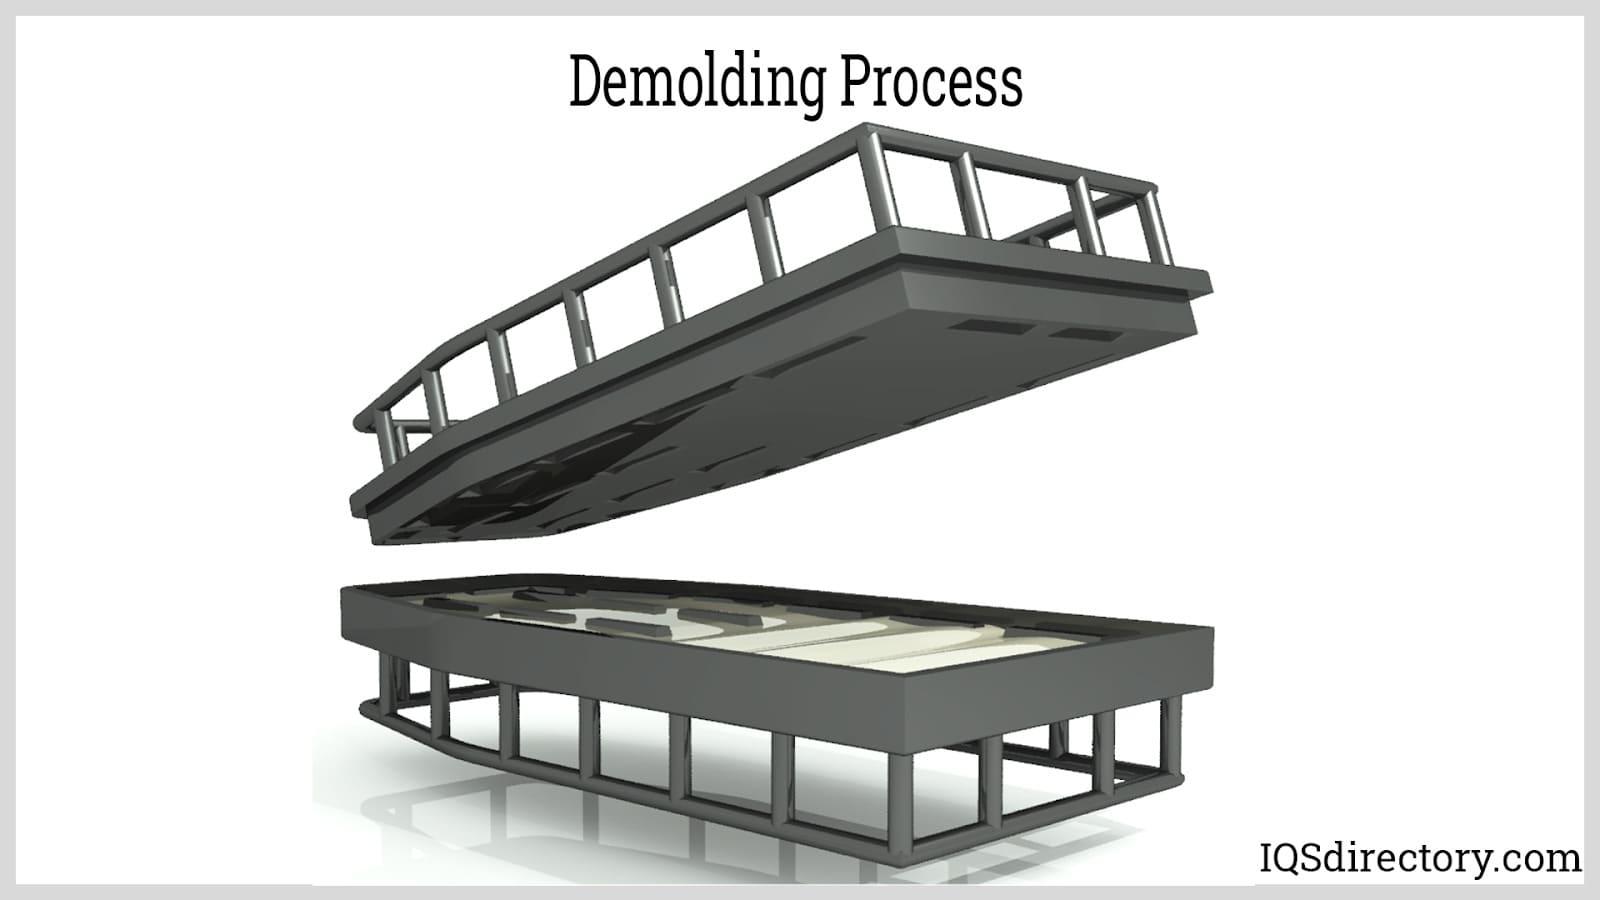 Demolding Process